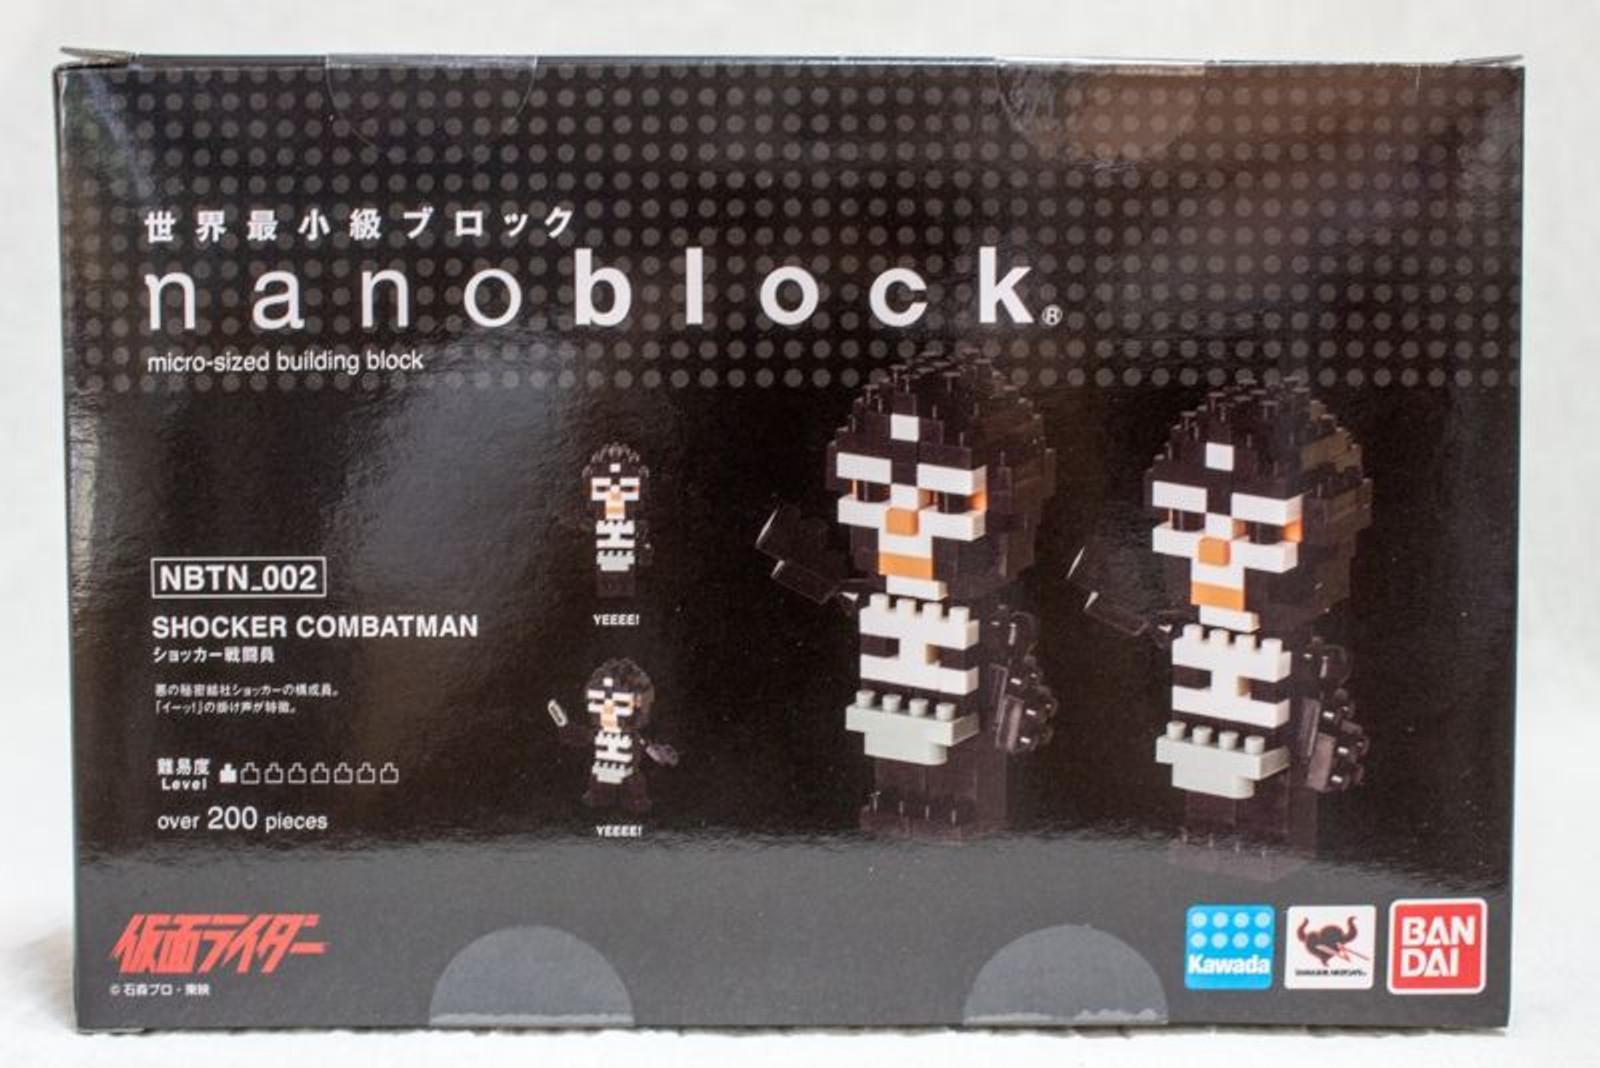 Kamen Rider Shocker Combatman Kawada Nanoblock Nano Block NBTN-002 JAPAN Figure